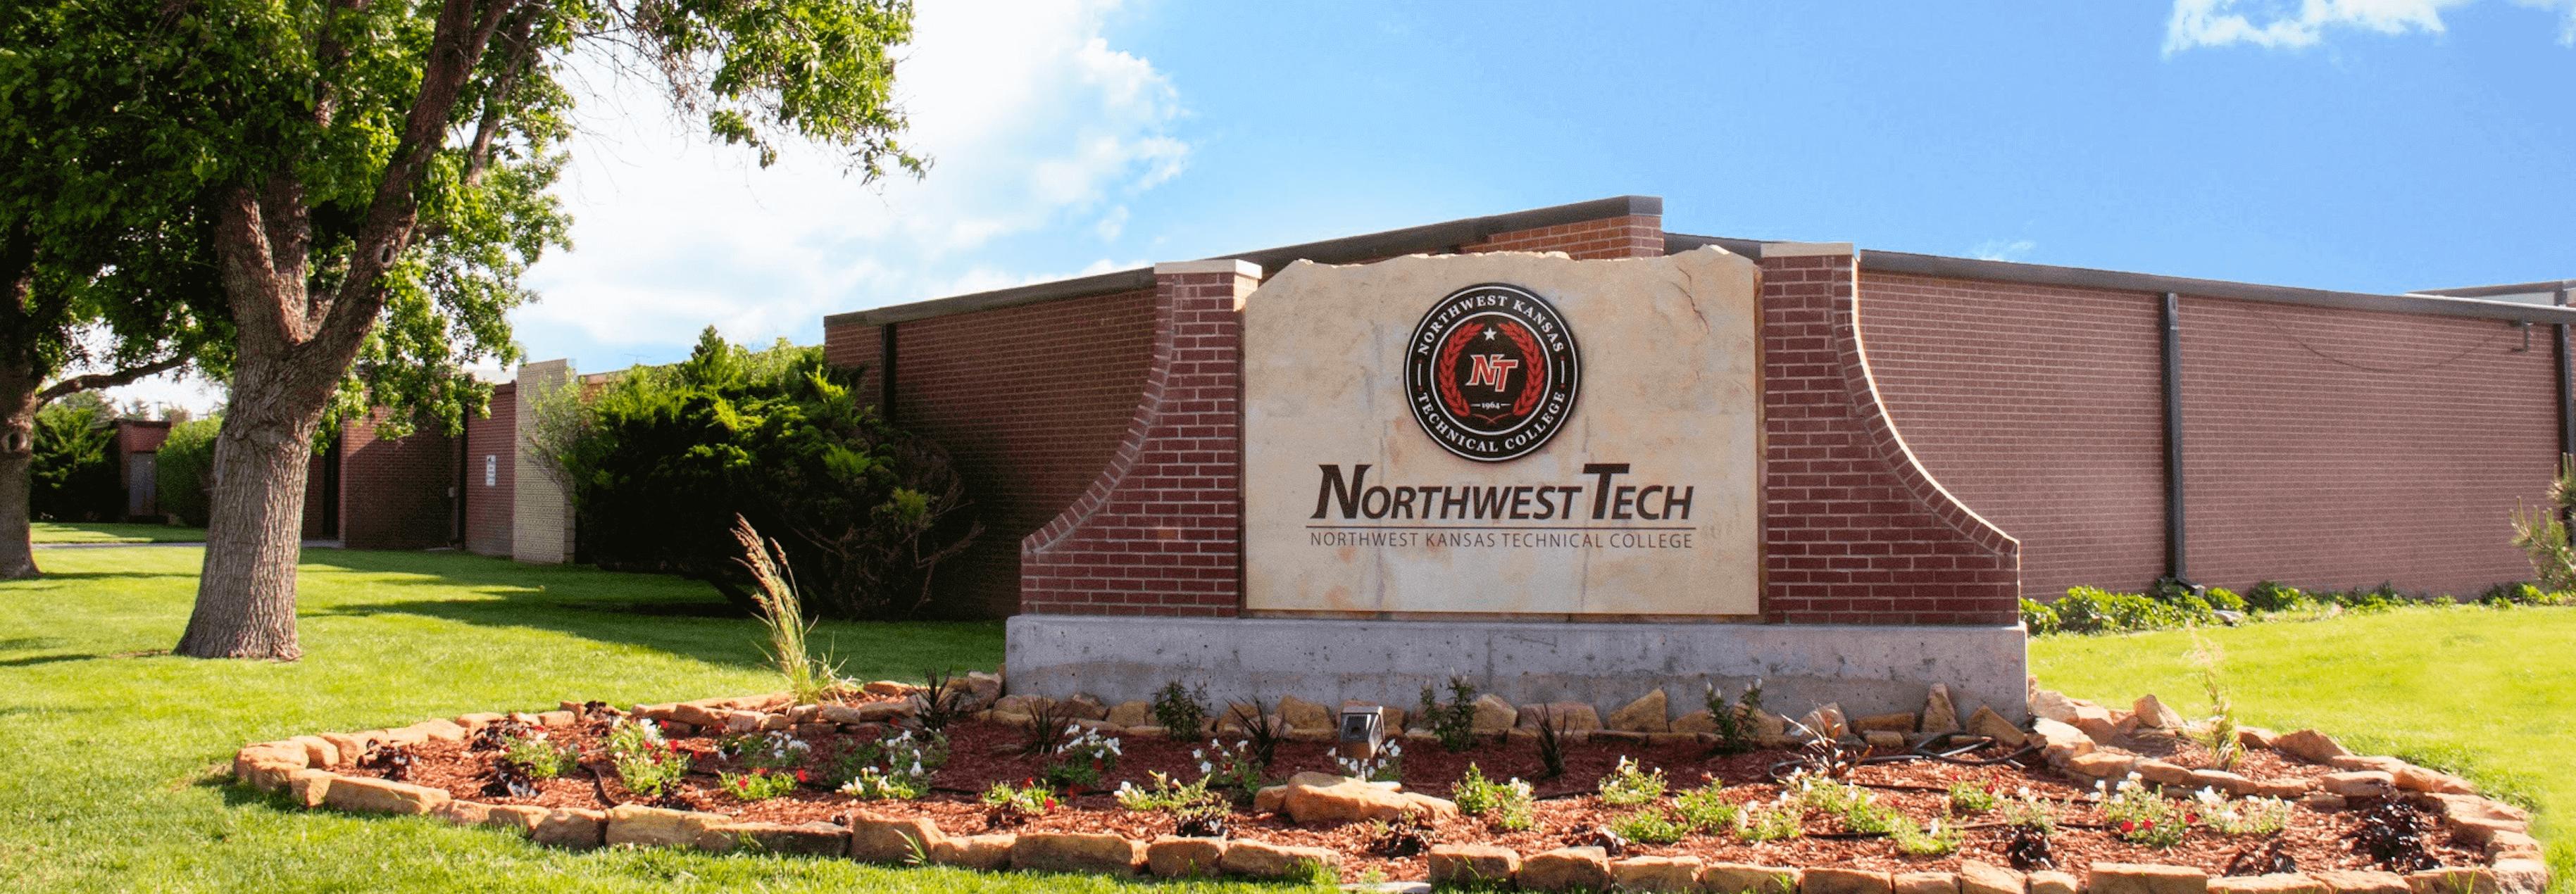 Northwest Tech Front